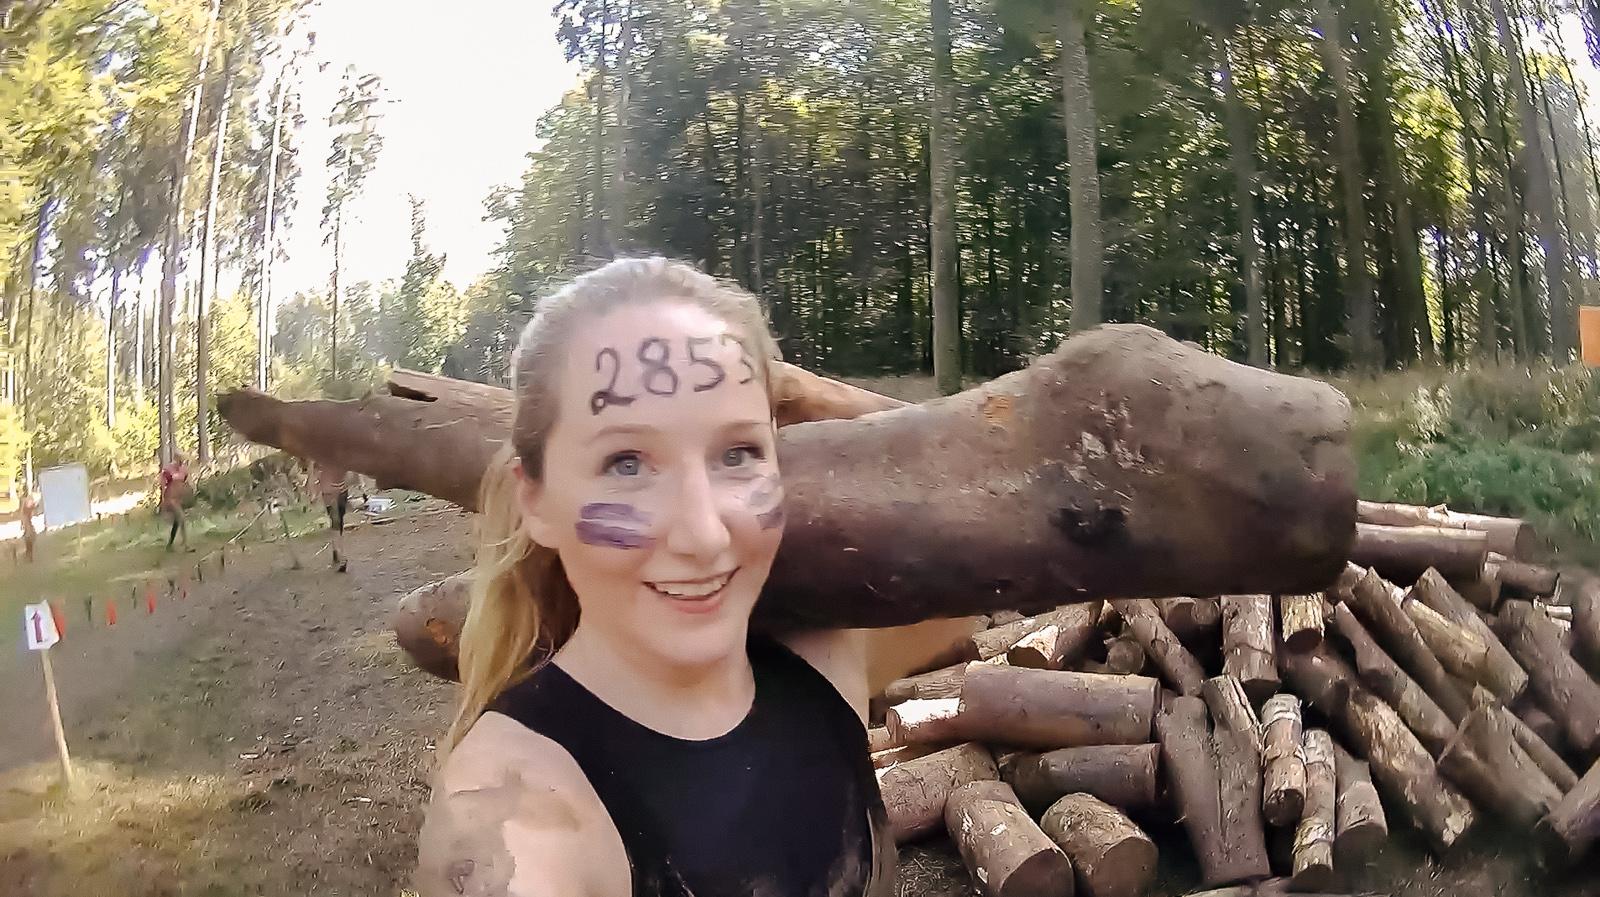 fitnessblog-fitnessblogger-fitness-blog-blogger-stuttgart-dreamteamfitness-tough-mudder-138